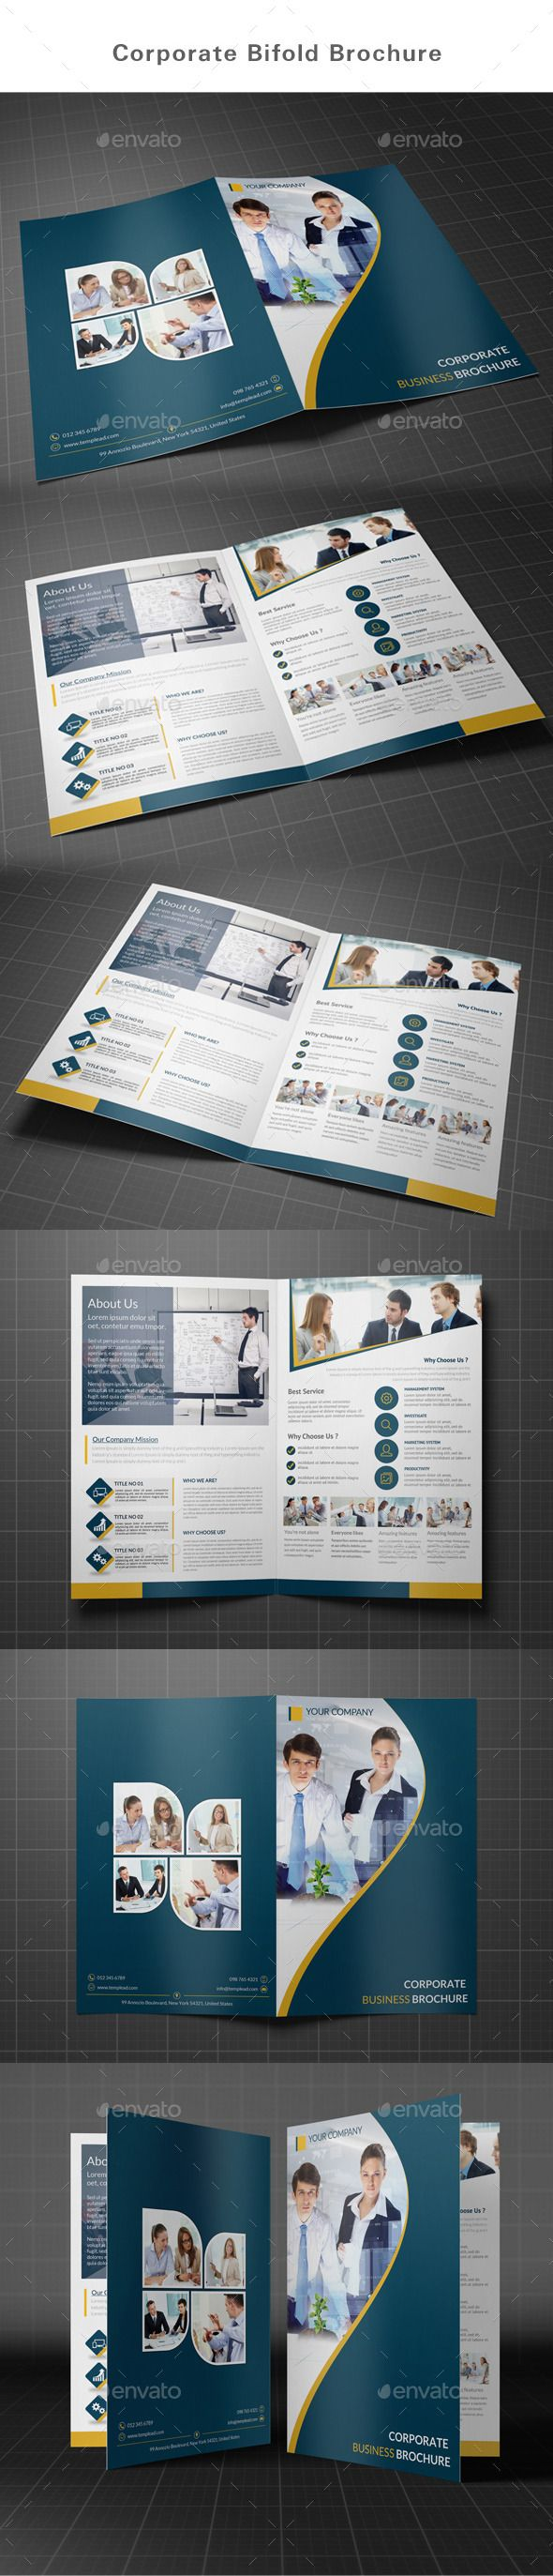 Business Bifold Brochure Tempalte #design Download: http://graphicriver.net/item/bifold-brochure-business/12926348?ref=ksioks